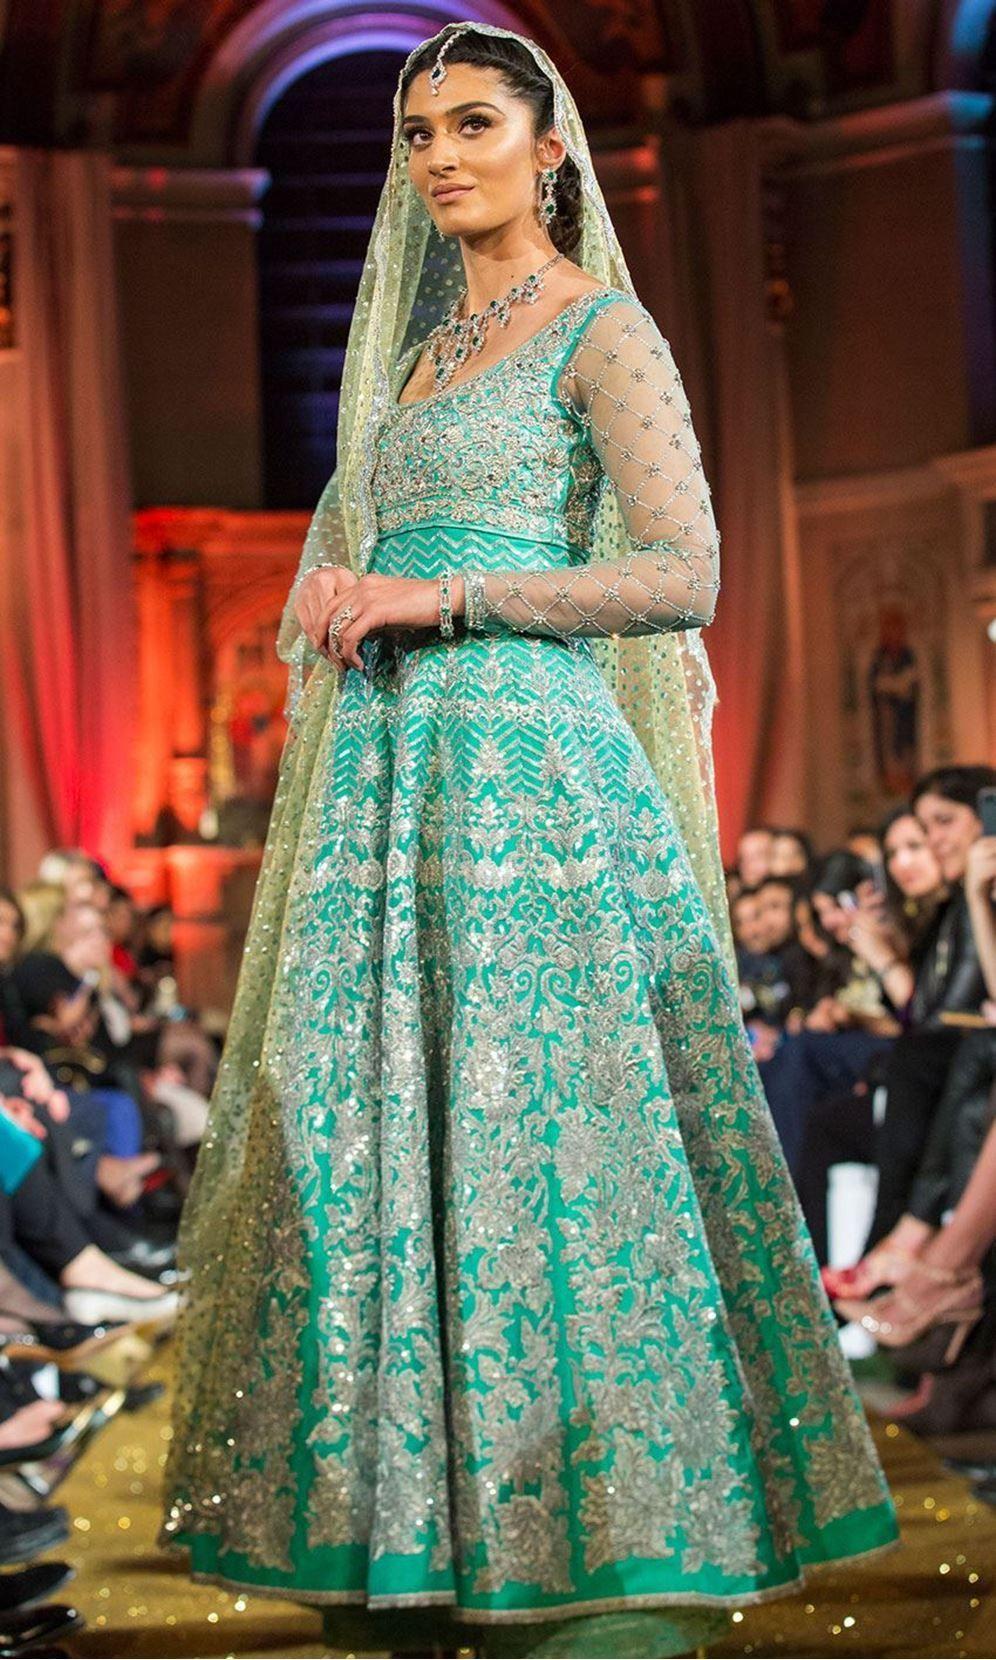 Nomi Ansari. Aqua Azure | Pakistani Fashion | Pinterest | Aqua ...